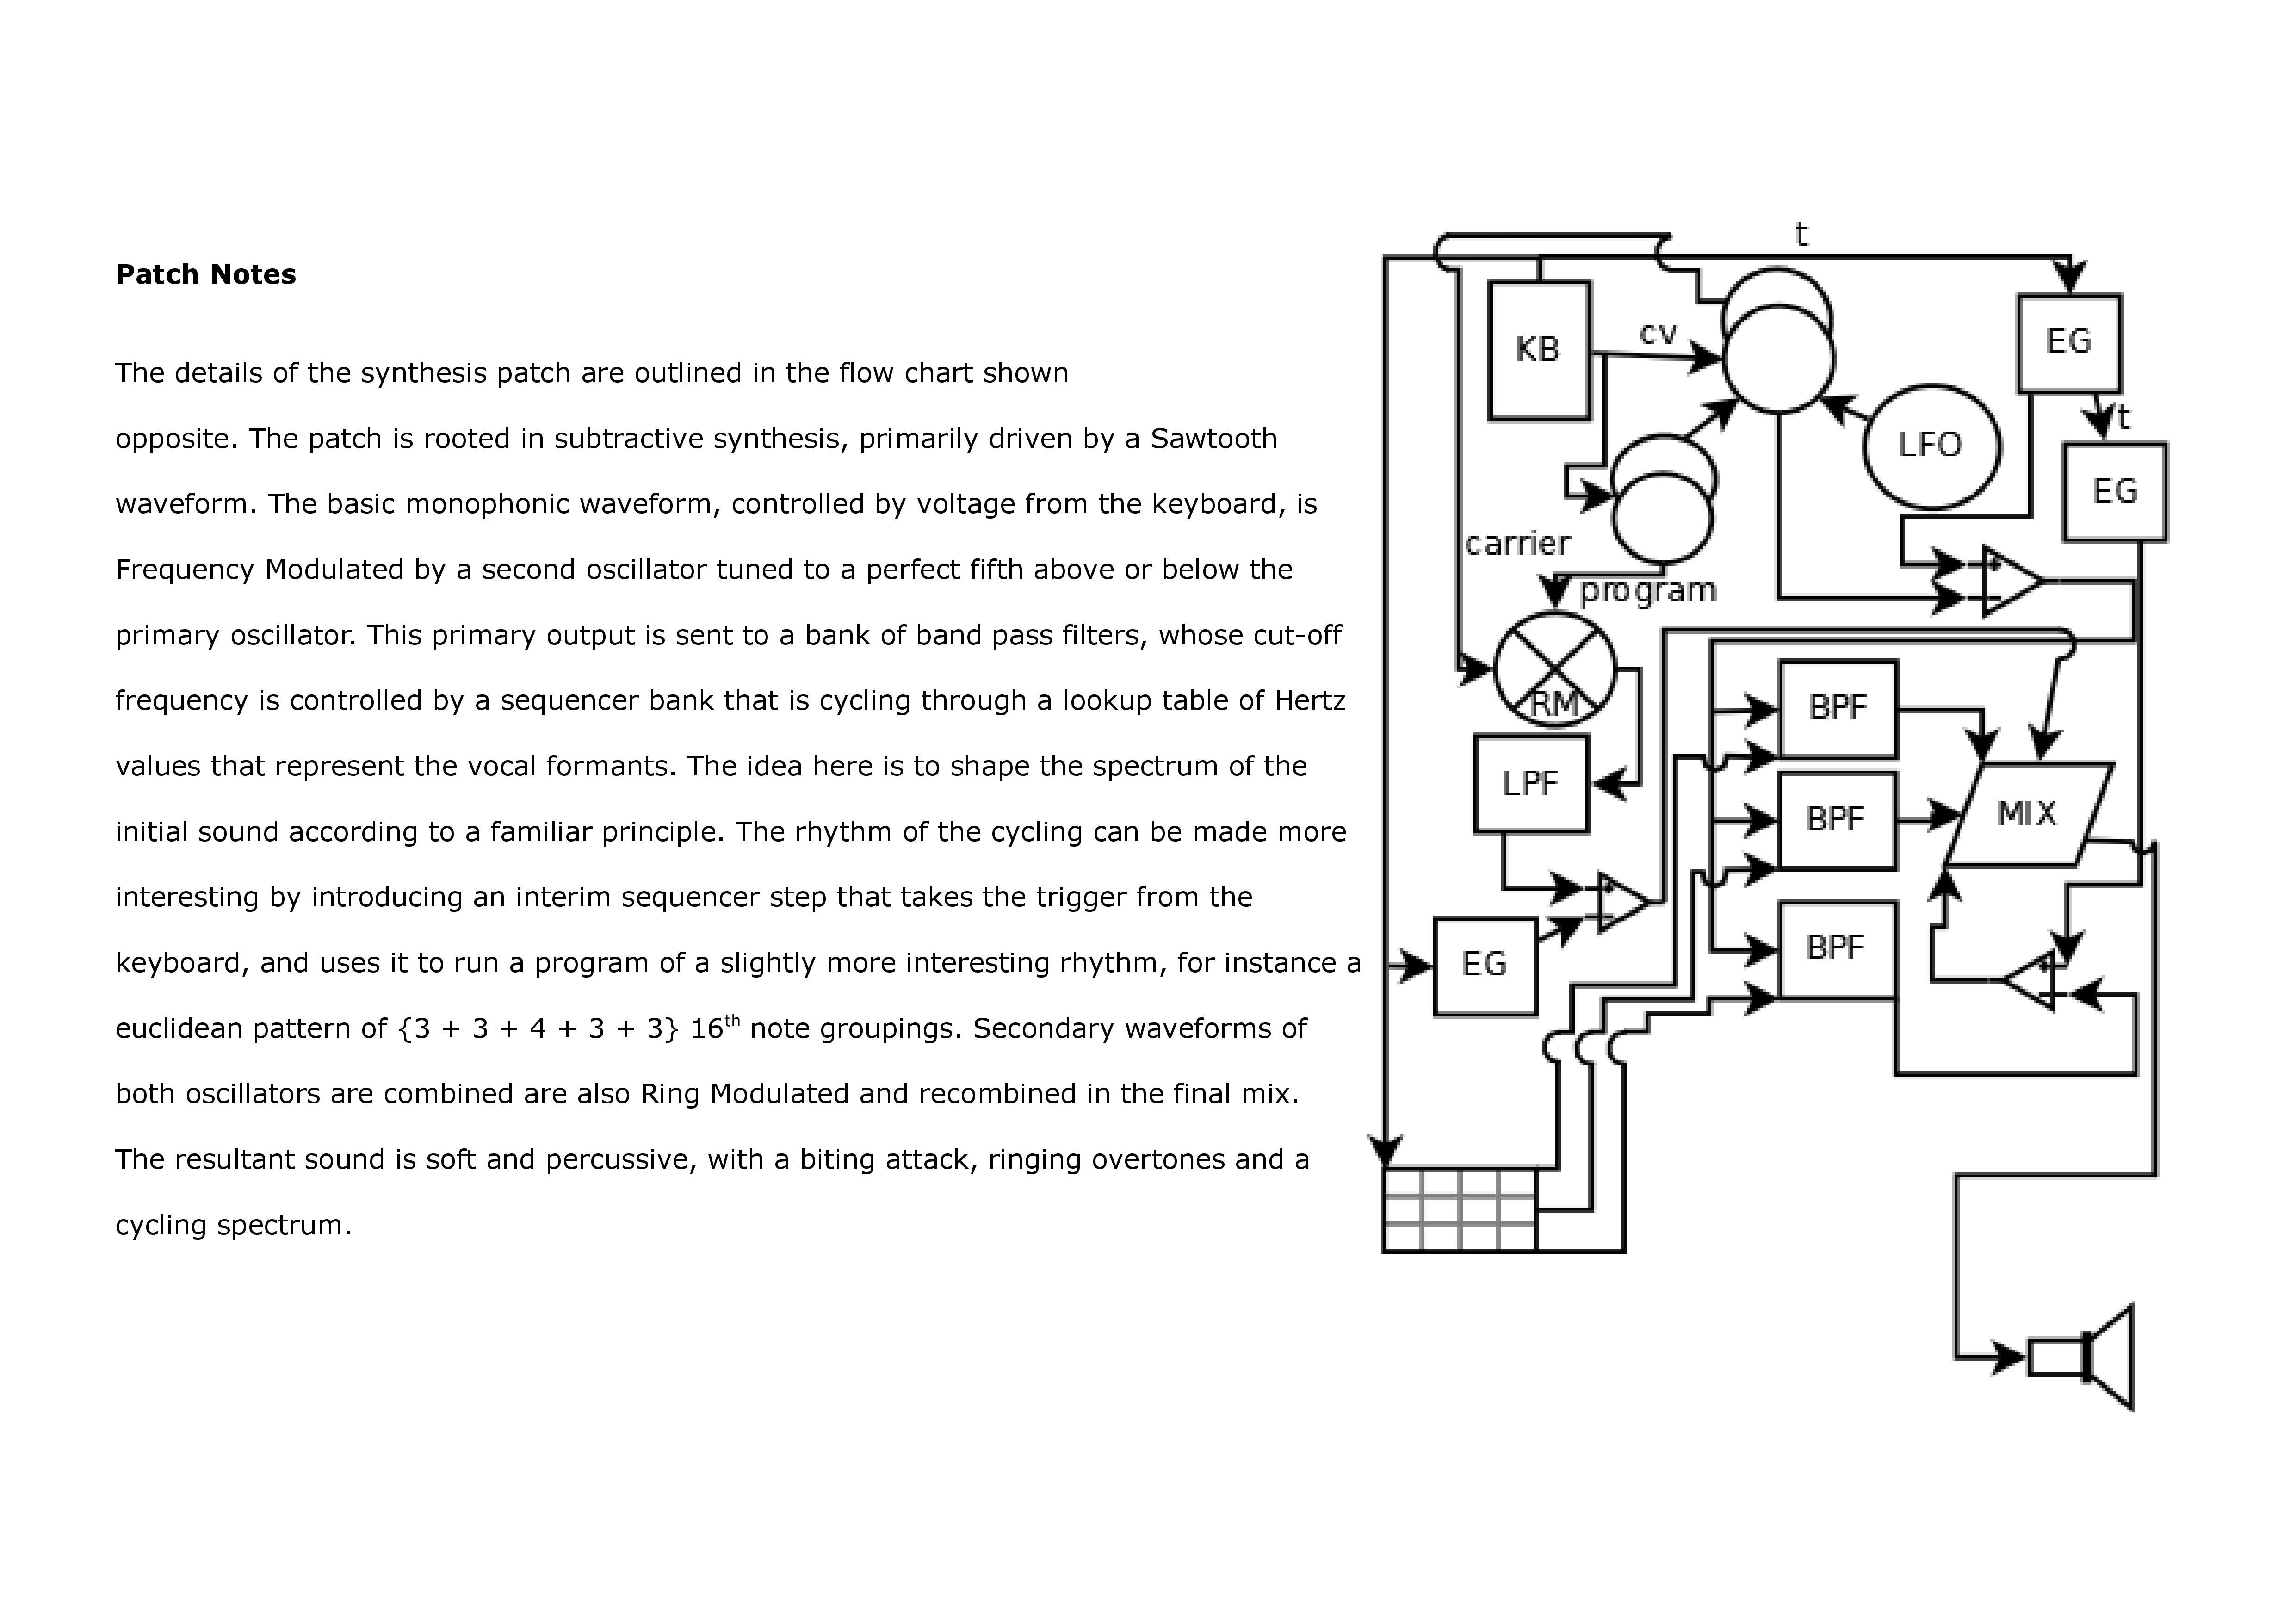 Mccartney vox humana page 004